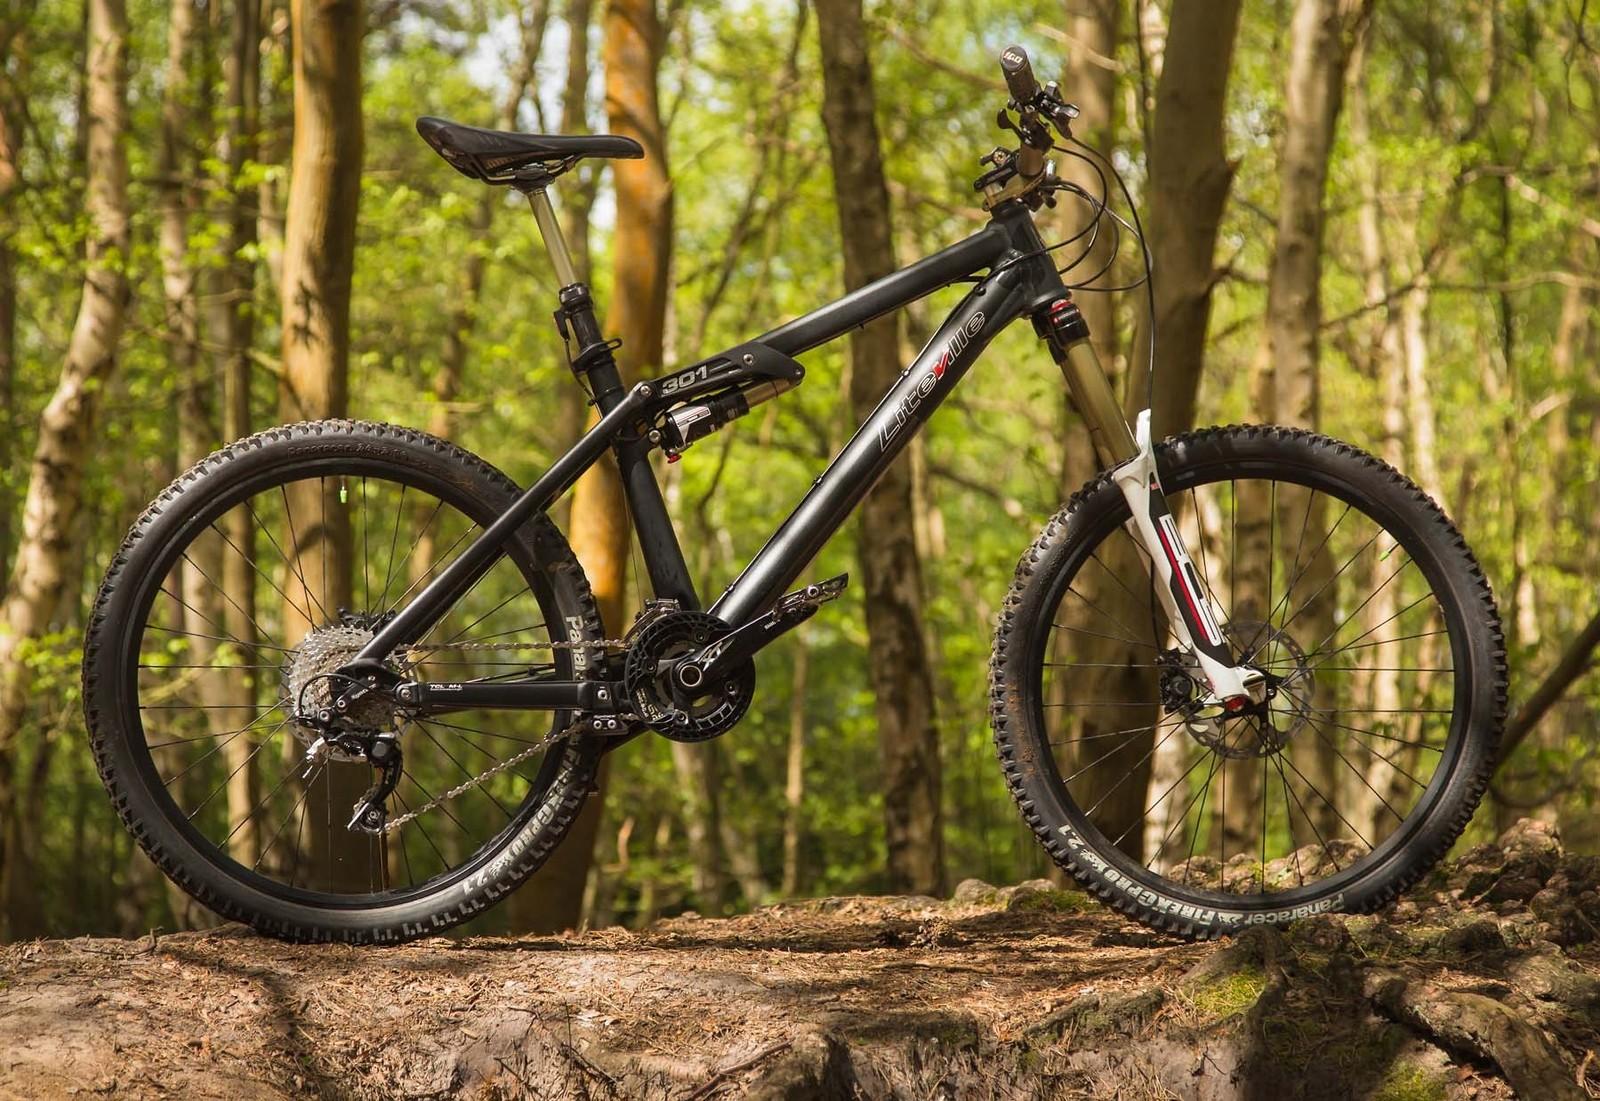 Liteville 301 mk11 m  - teknorob - Mountain Biking Pictures - Vital MTB